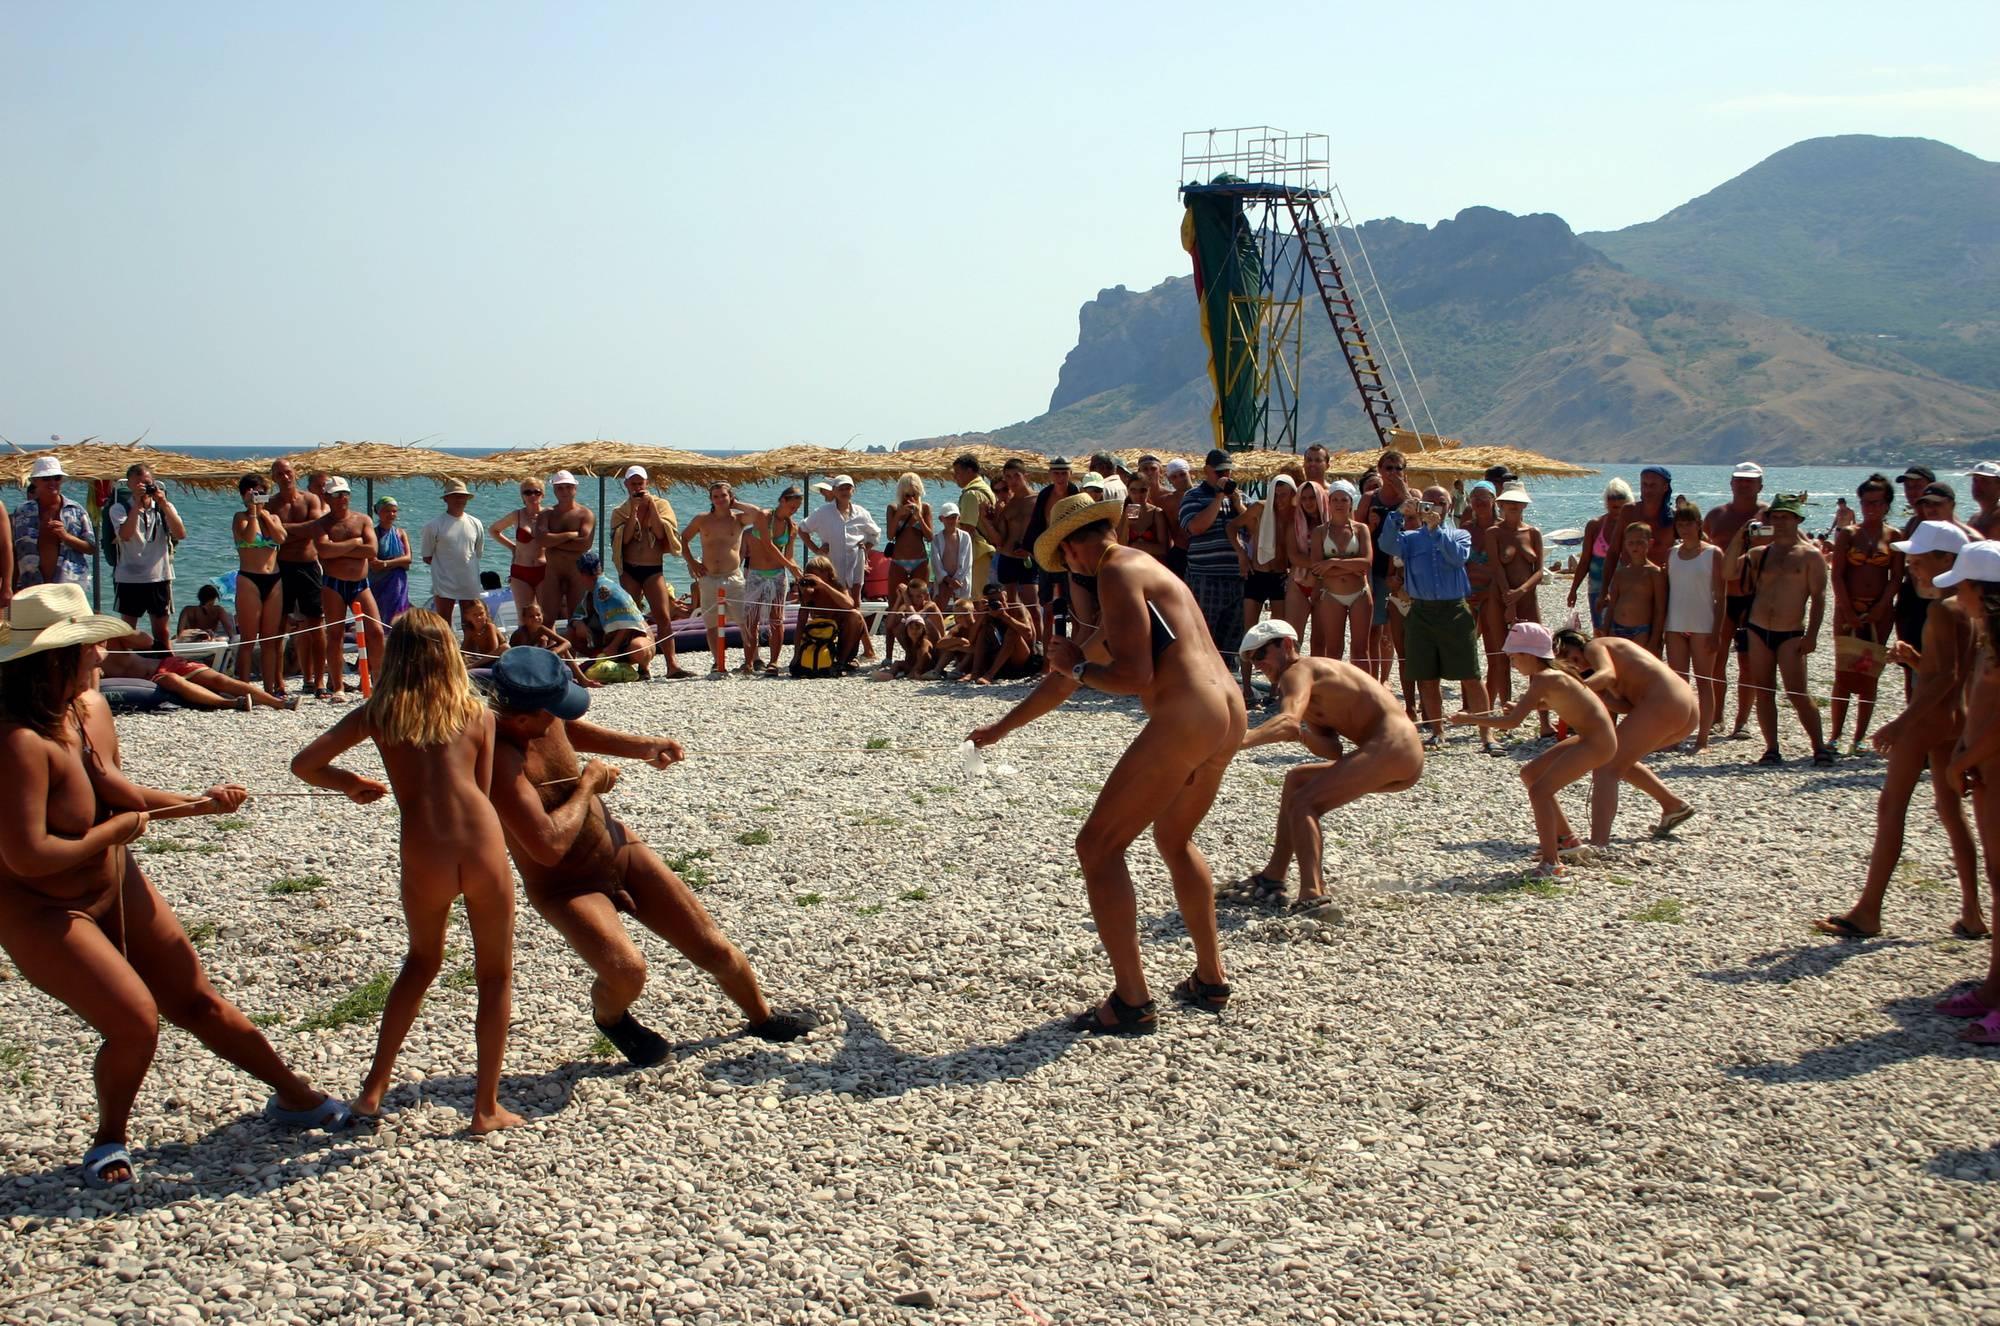 Nudist Photos Beach Rope Pull Fighting - 1